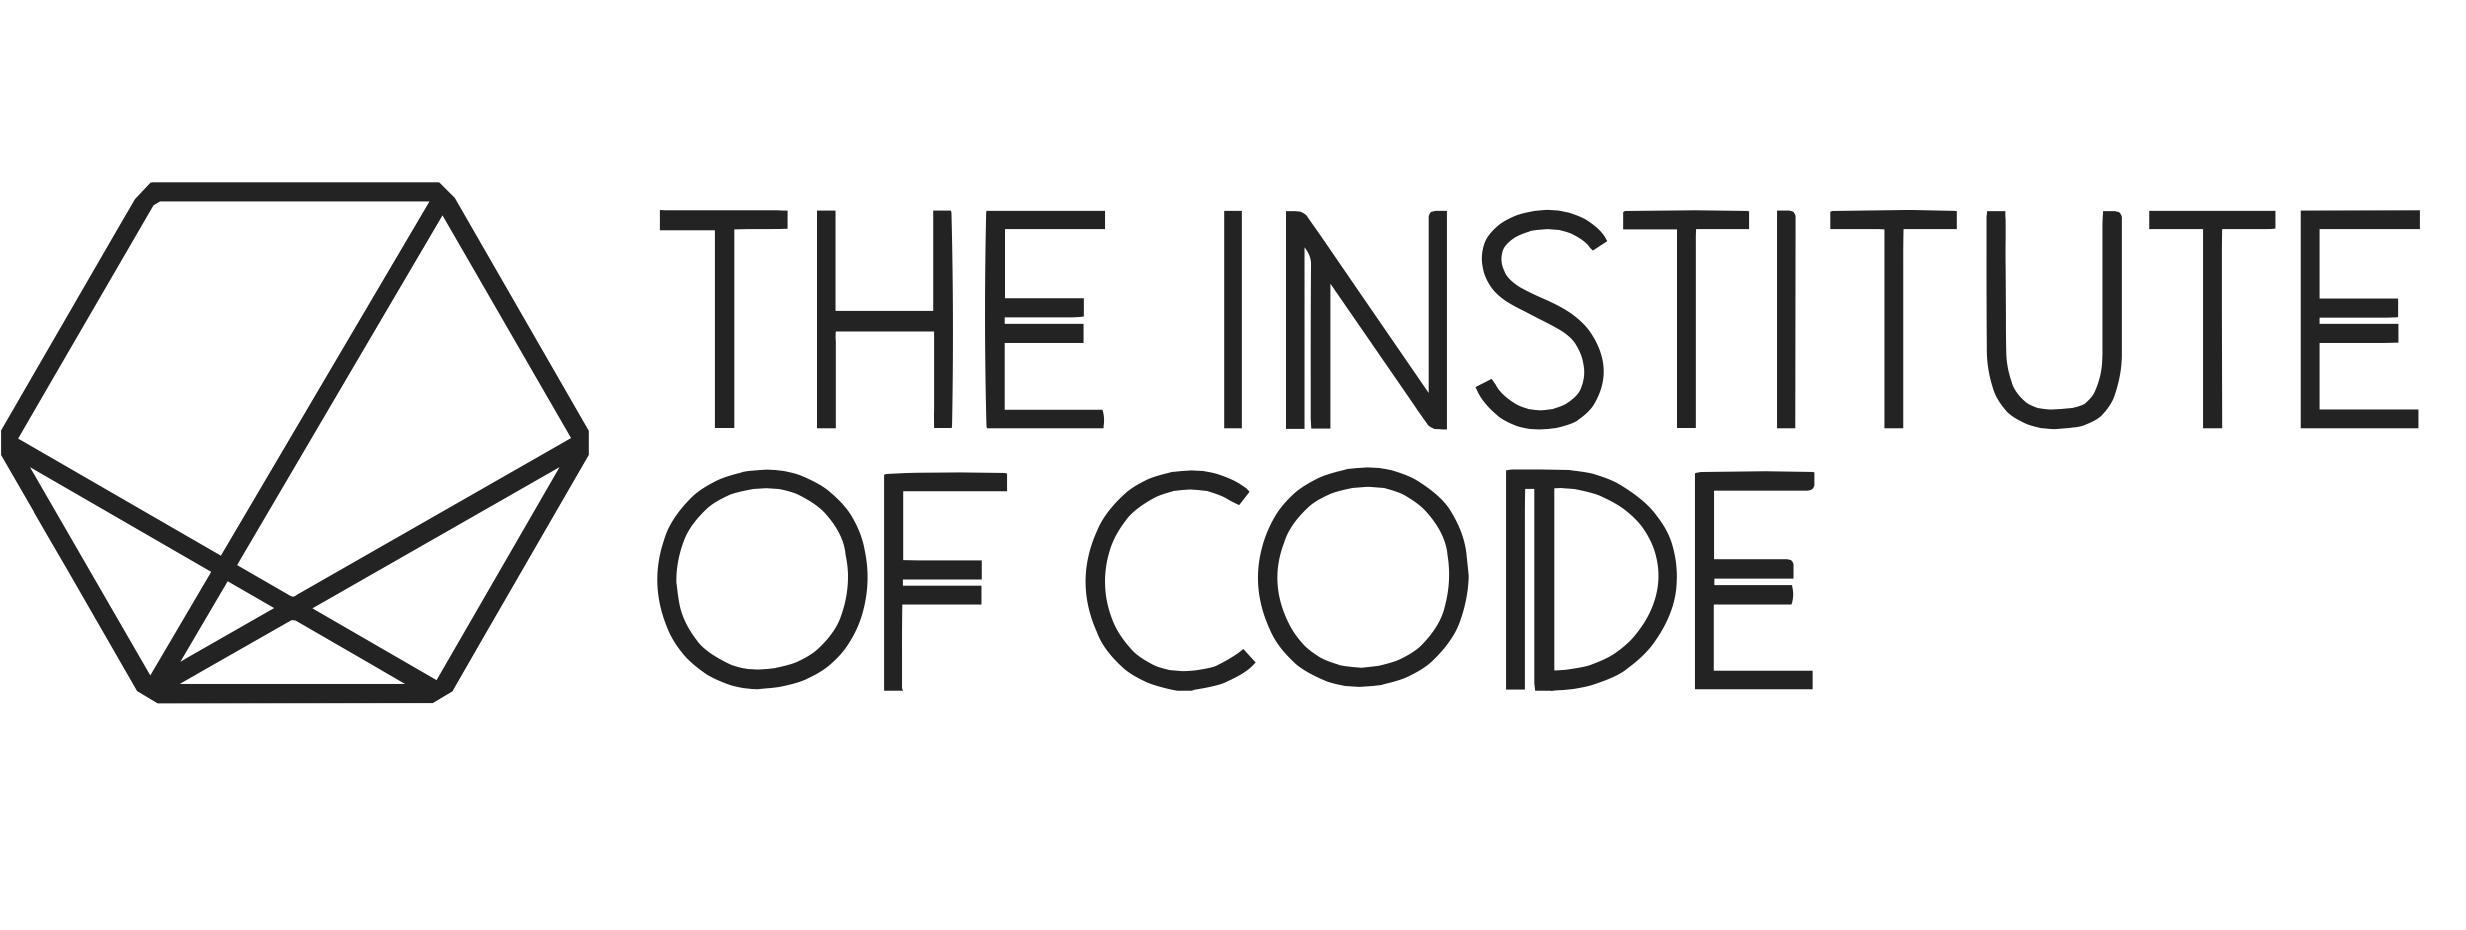 institute-of-code-logo.png